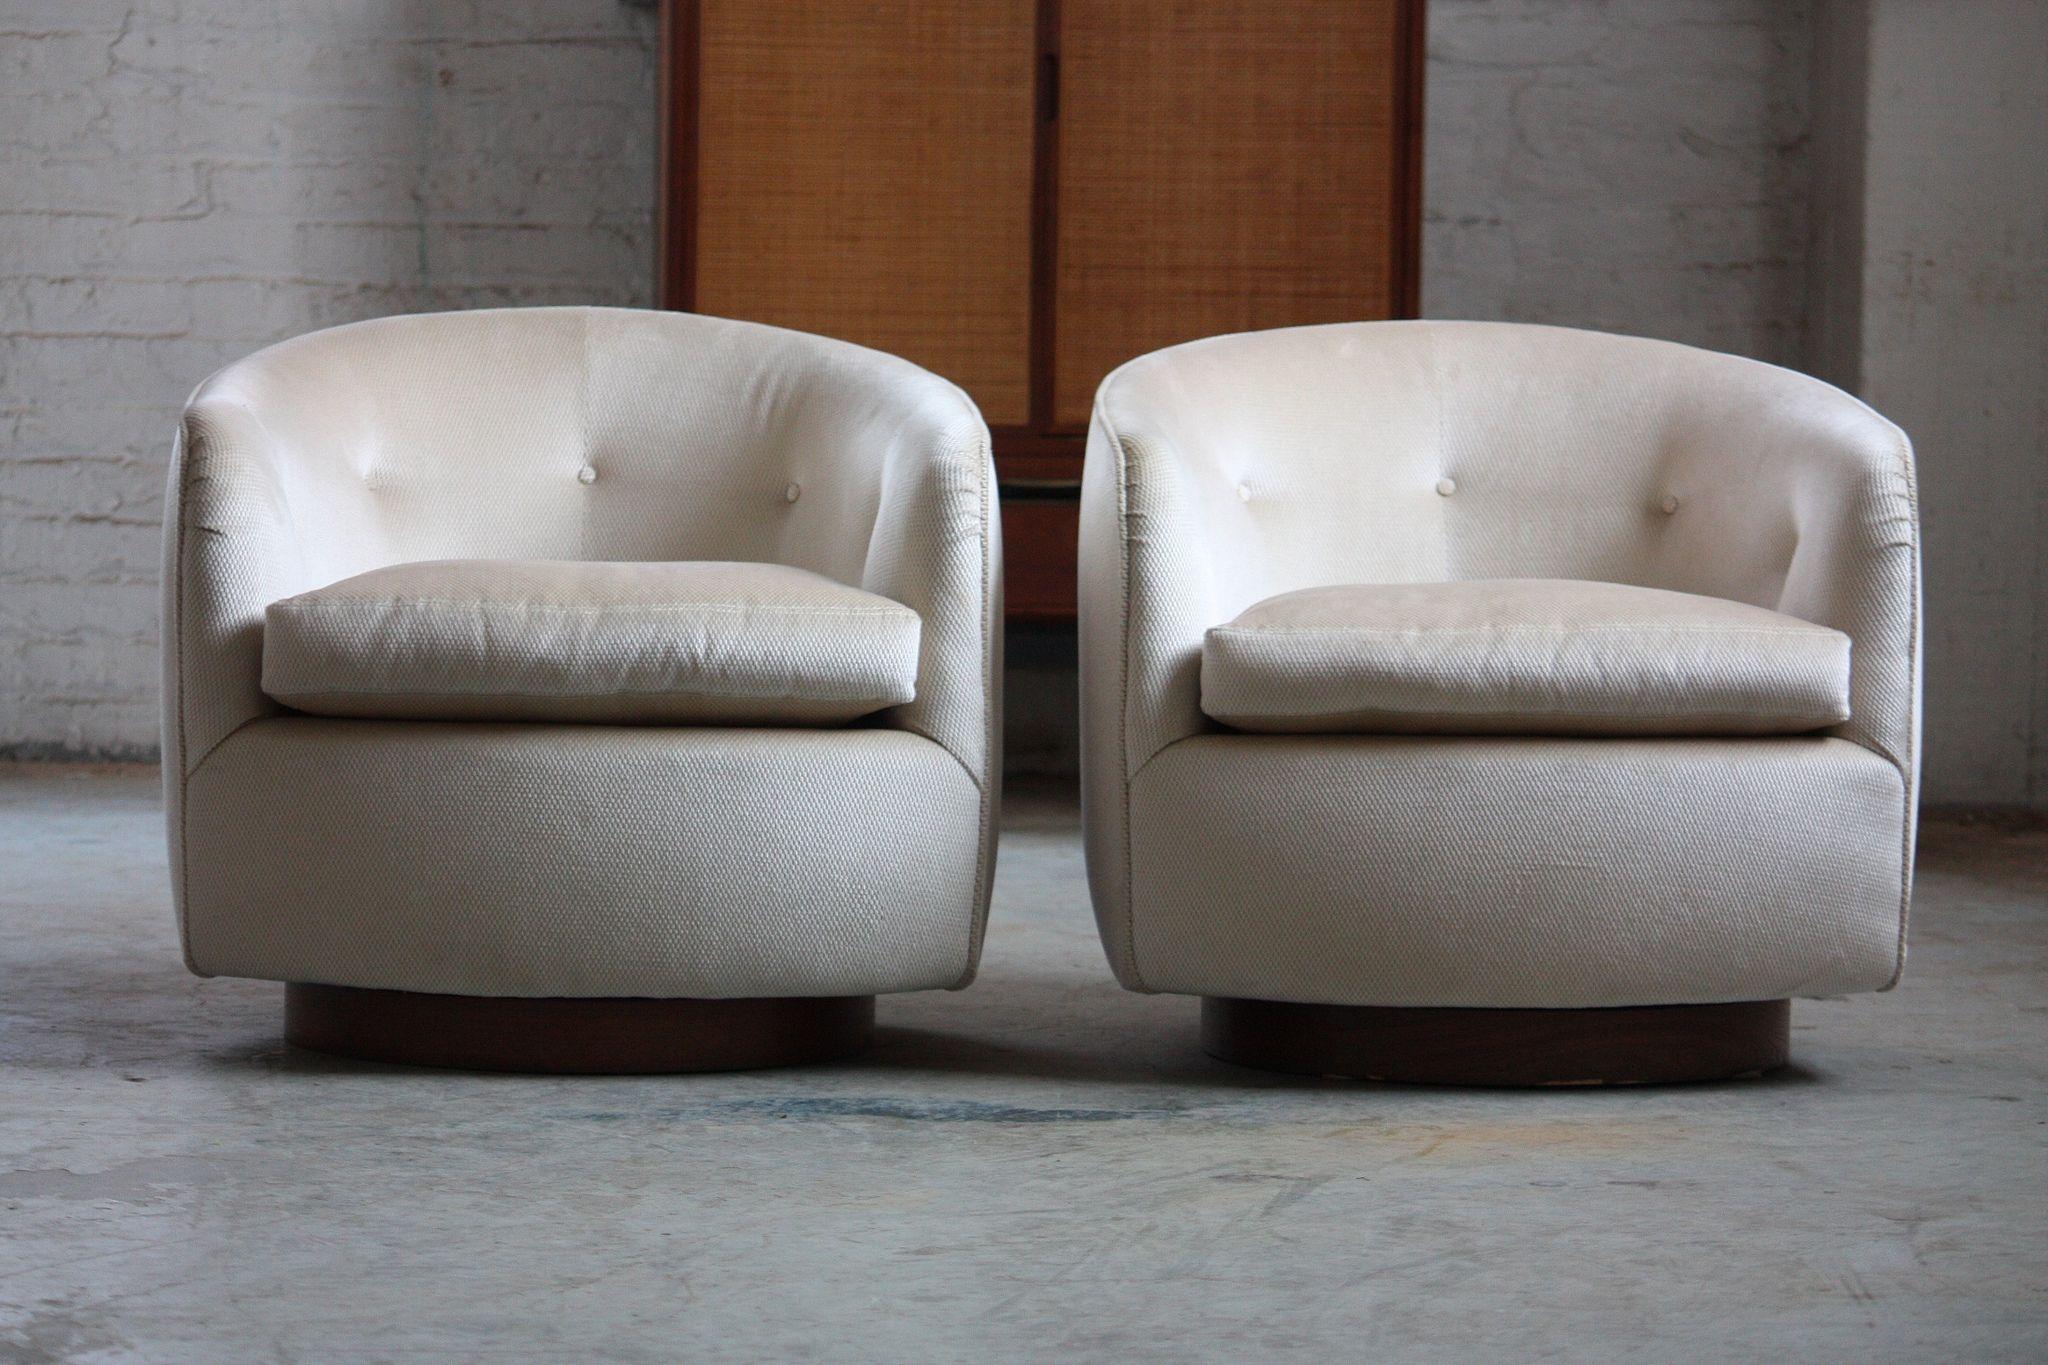 Ferocious Milo Baughman Mid Century Modern Swivel Rocker Barrel Club Chairs  (U.S.A., 1970s) | By Kennyk@k2modern.com